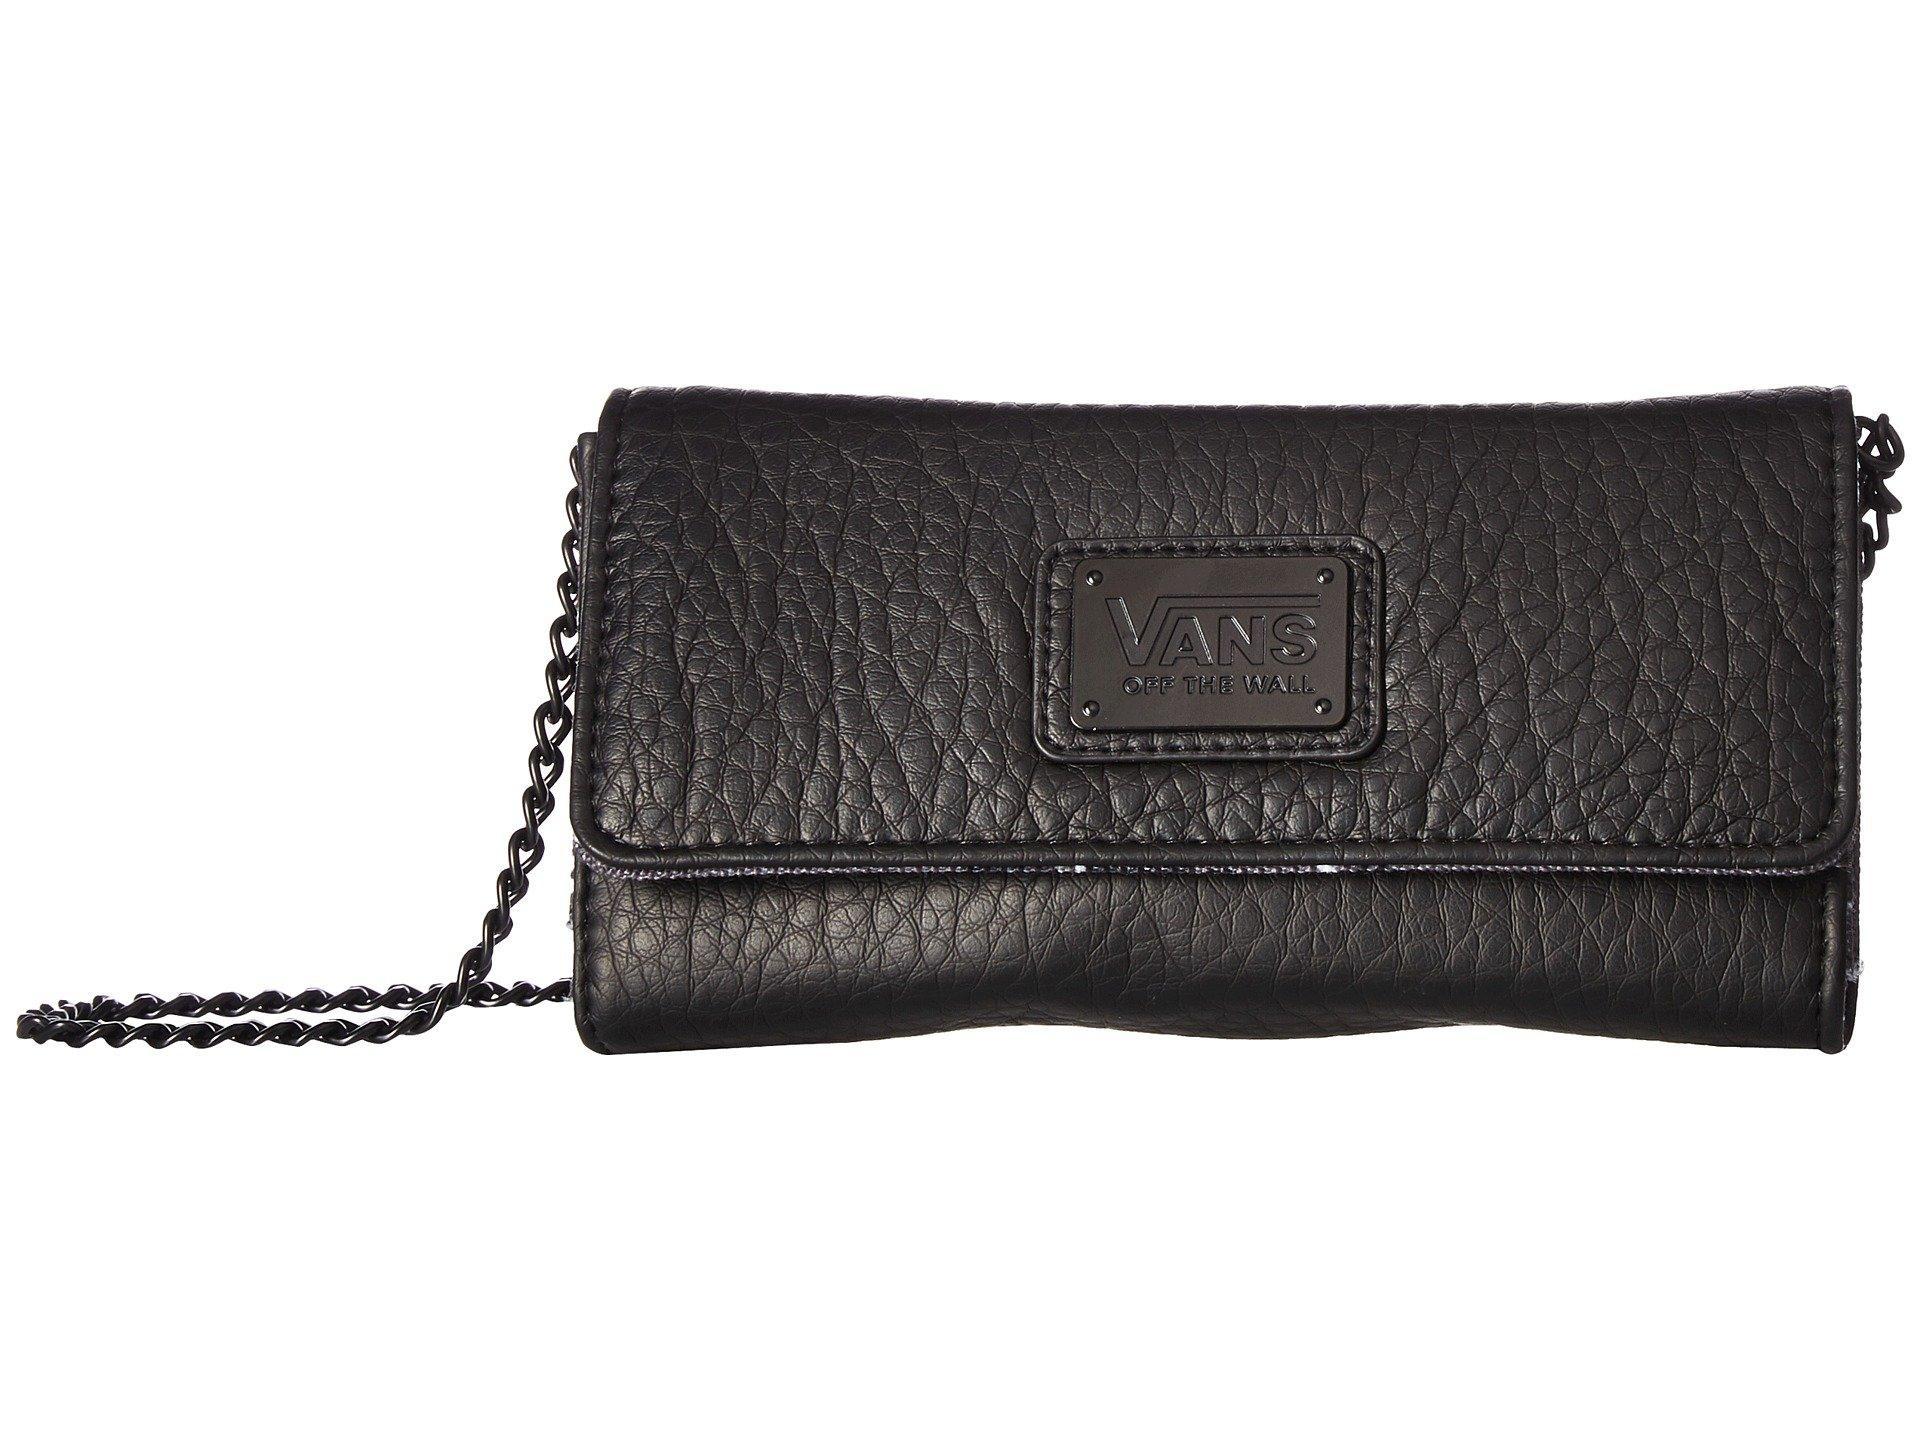 b0fa67b68ccd23 Lyst - Vans Chained Reaction Wallet (black leopard) Wallet Handbags ...